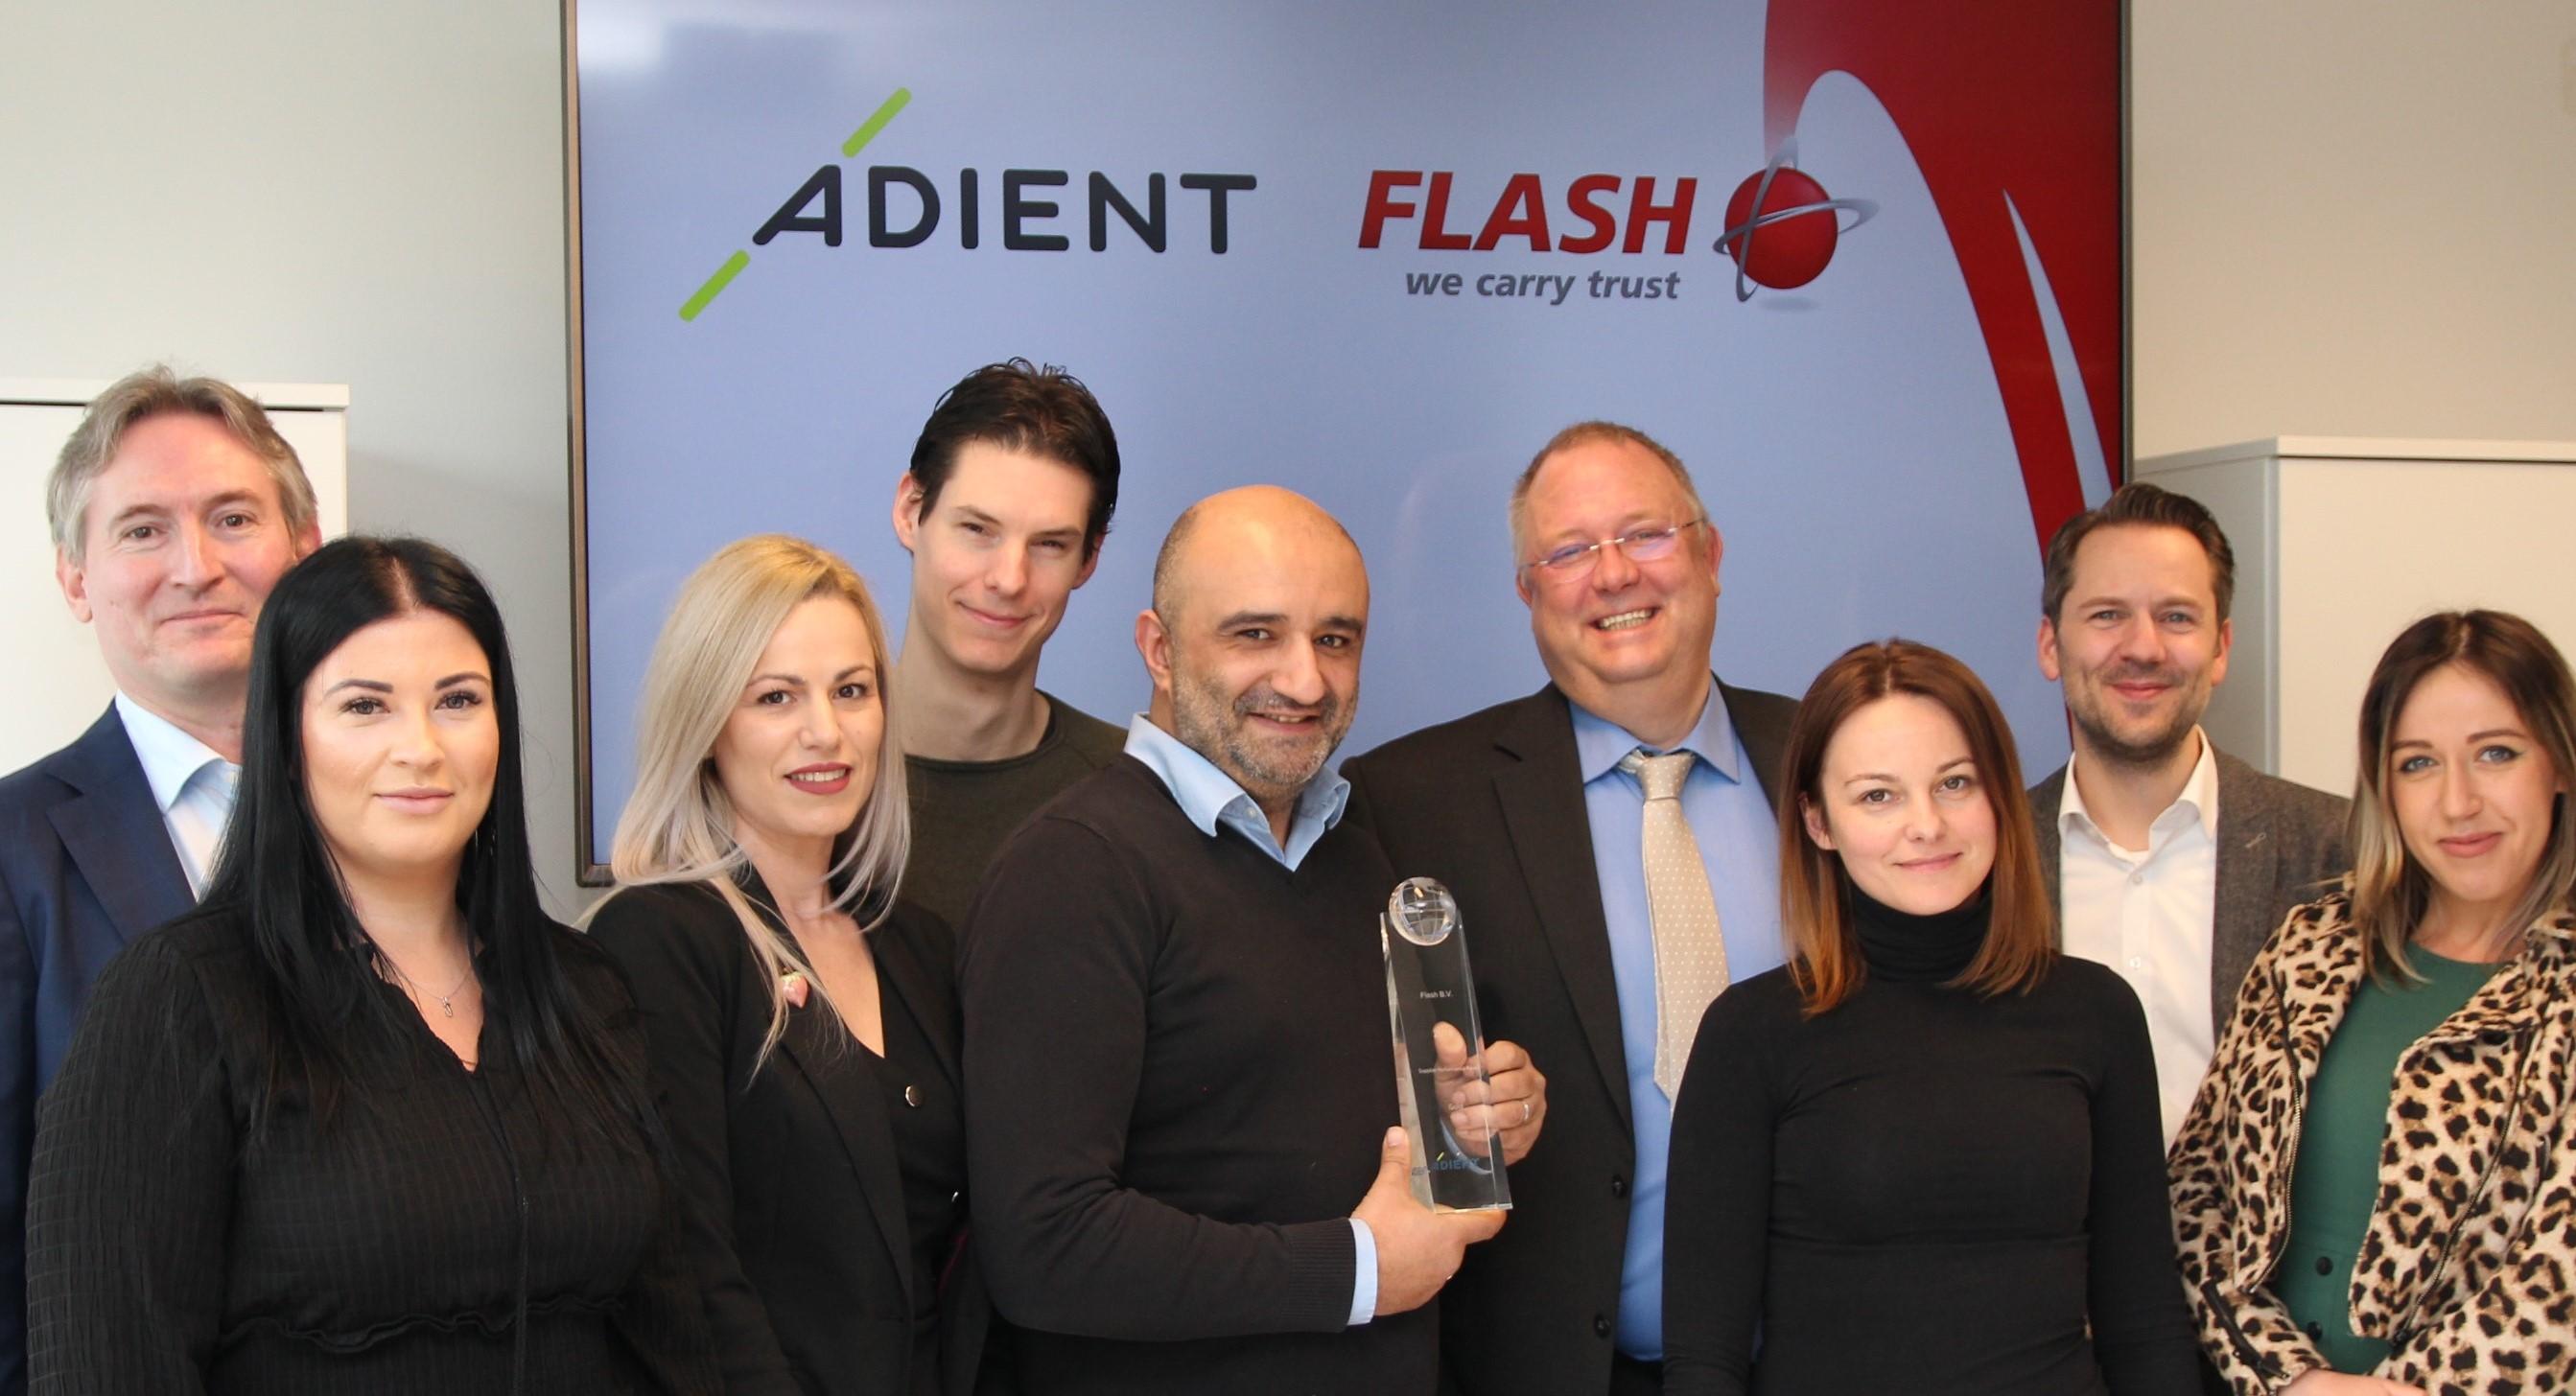 falsh adient supply chain award